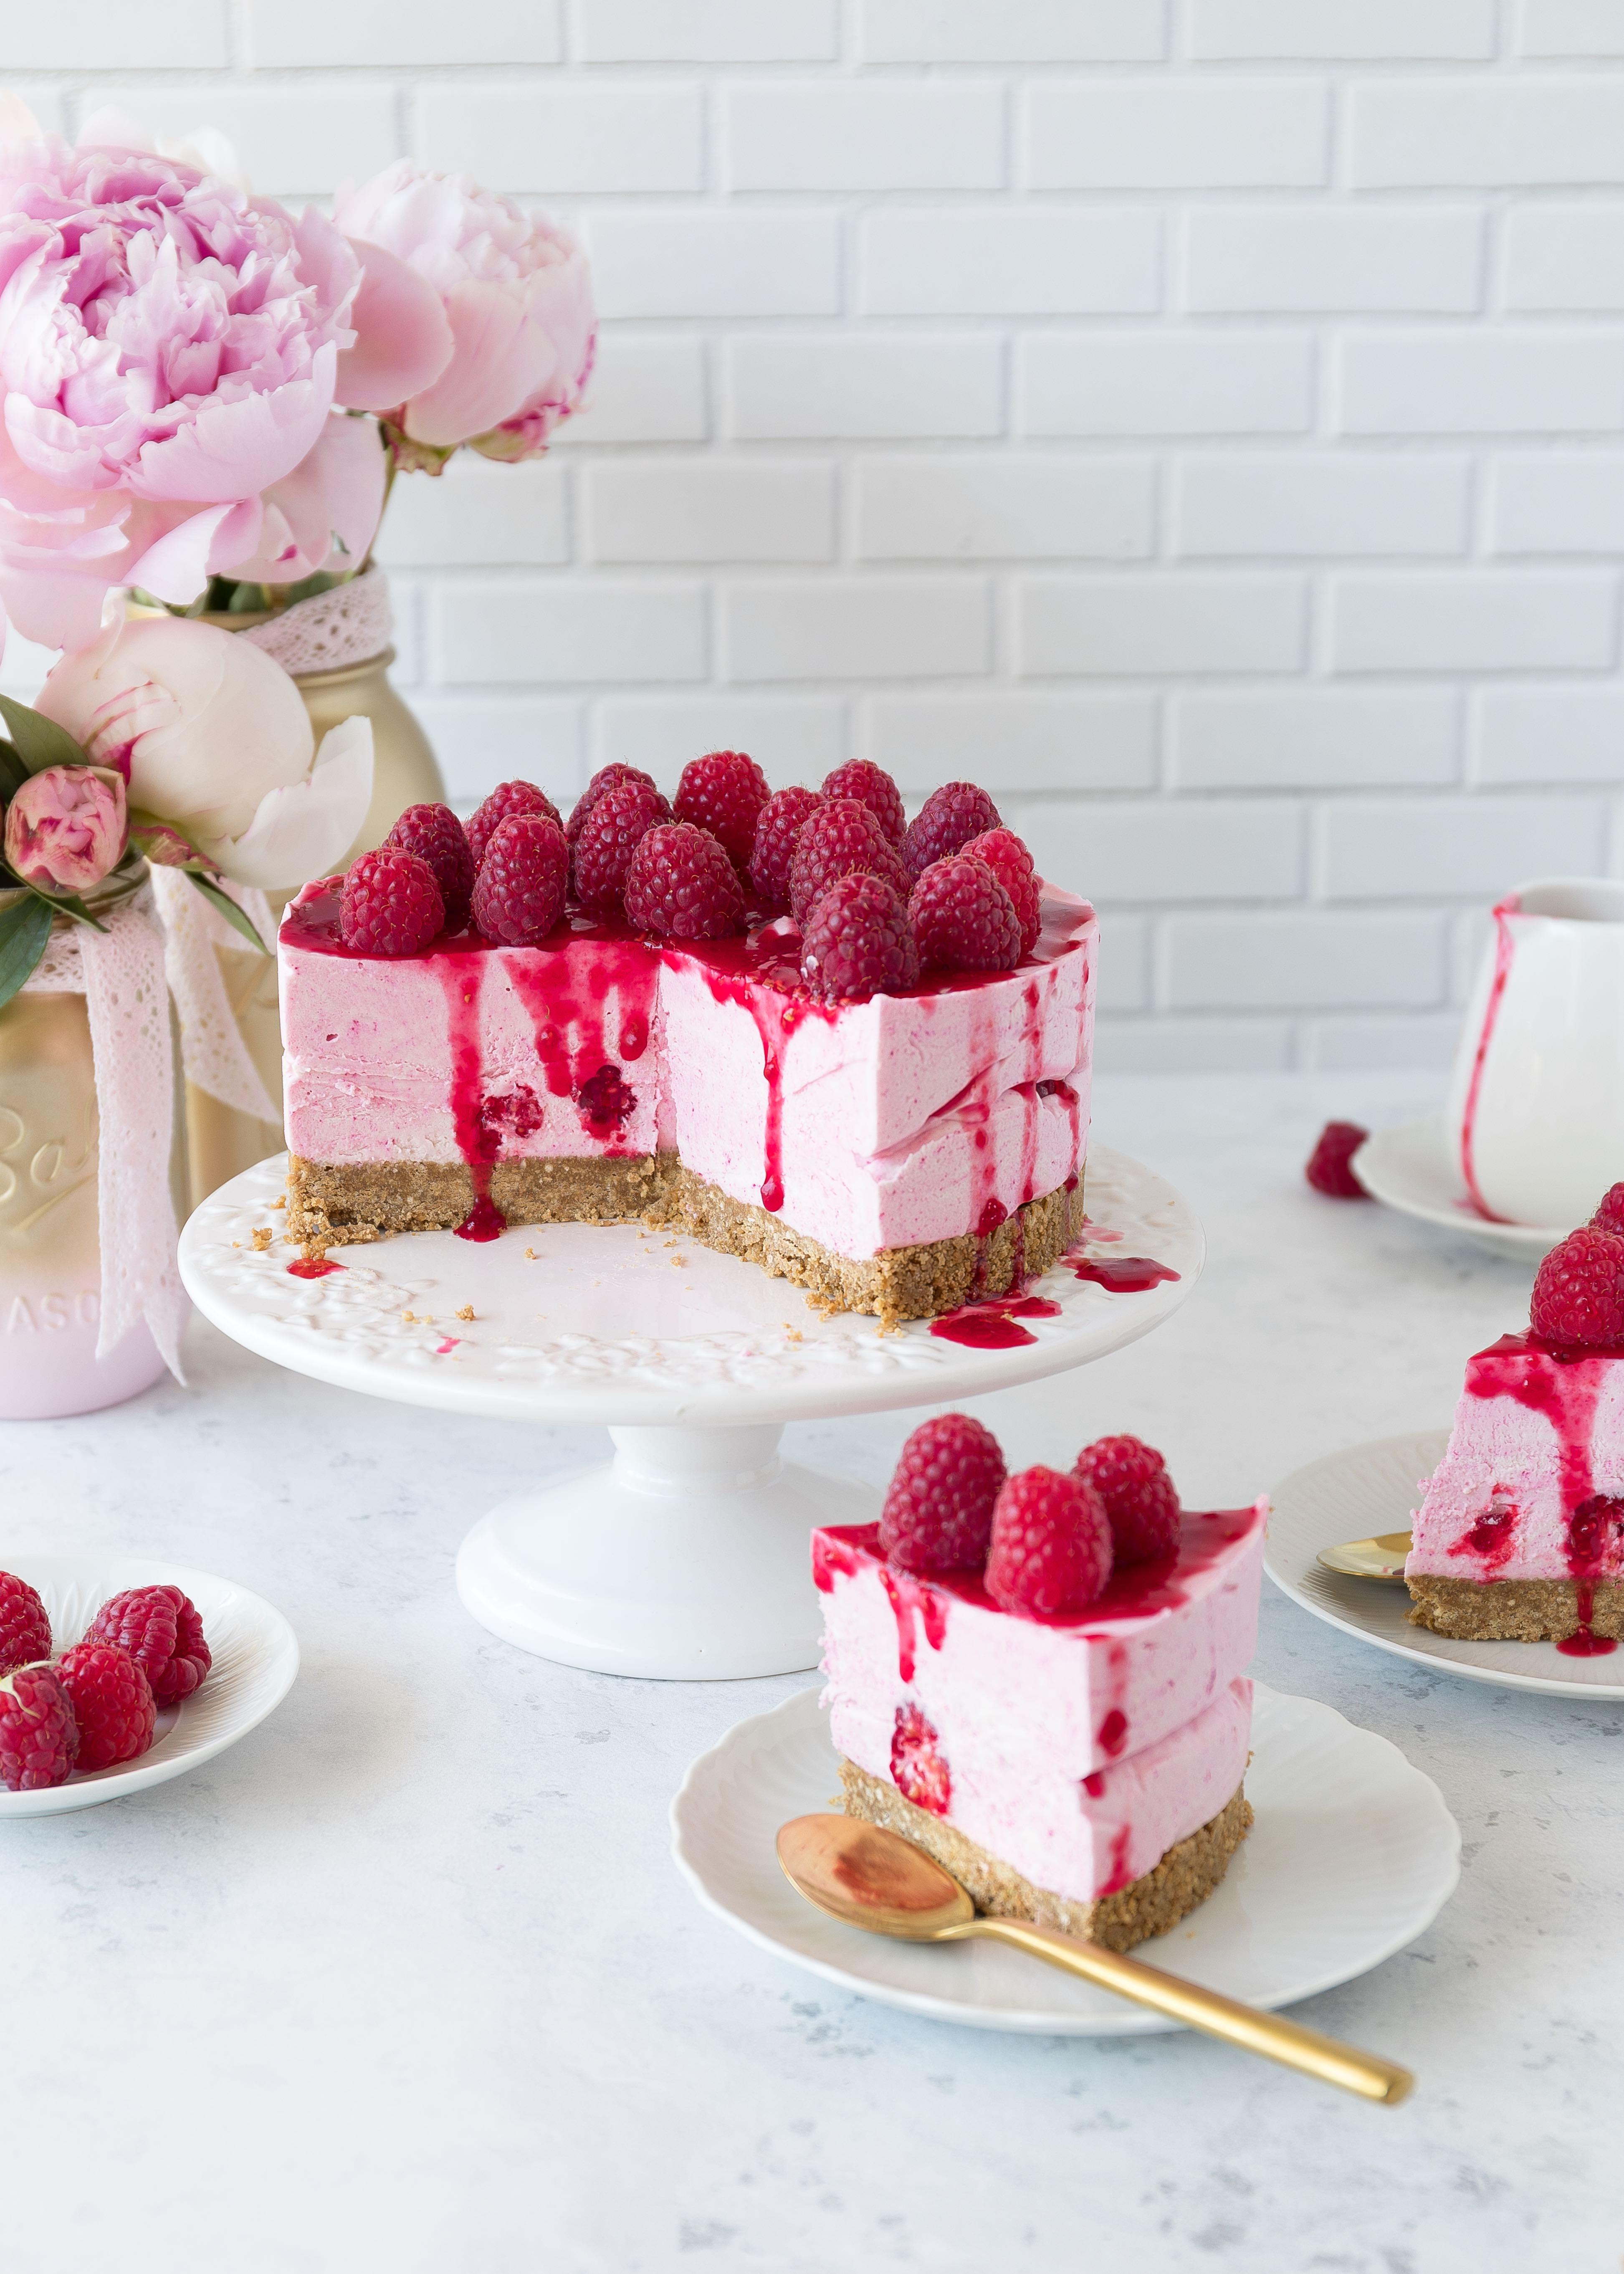 Cheesecake Rezept: Semifreddo Himbeer Cheesecake ohne Backen Eistorte ice cream cake raspberry sommer #semifreddo #cheesecake #eistorte #torte #nobake   Emma´s Lieblingsstücke